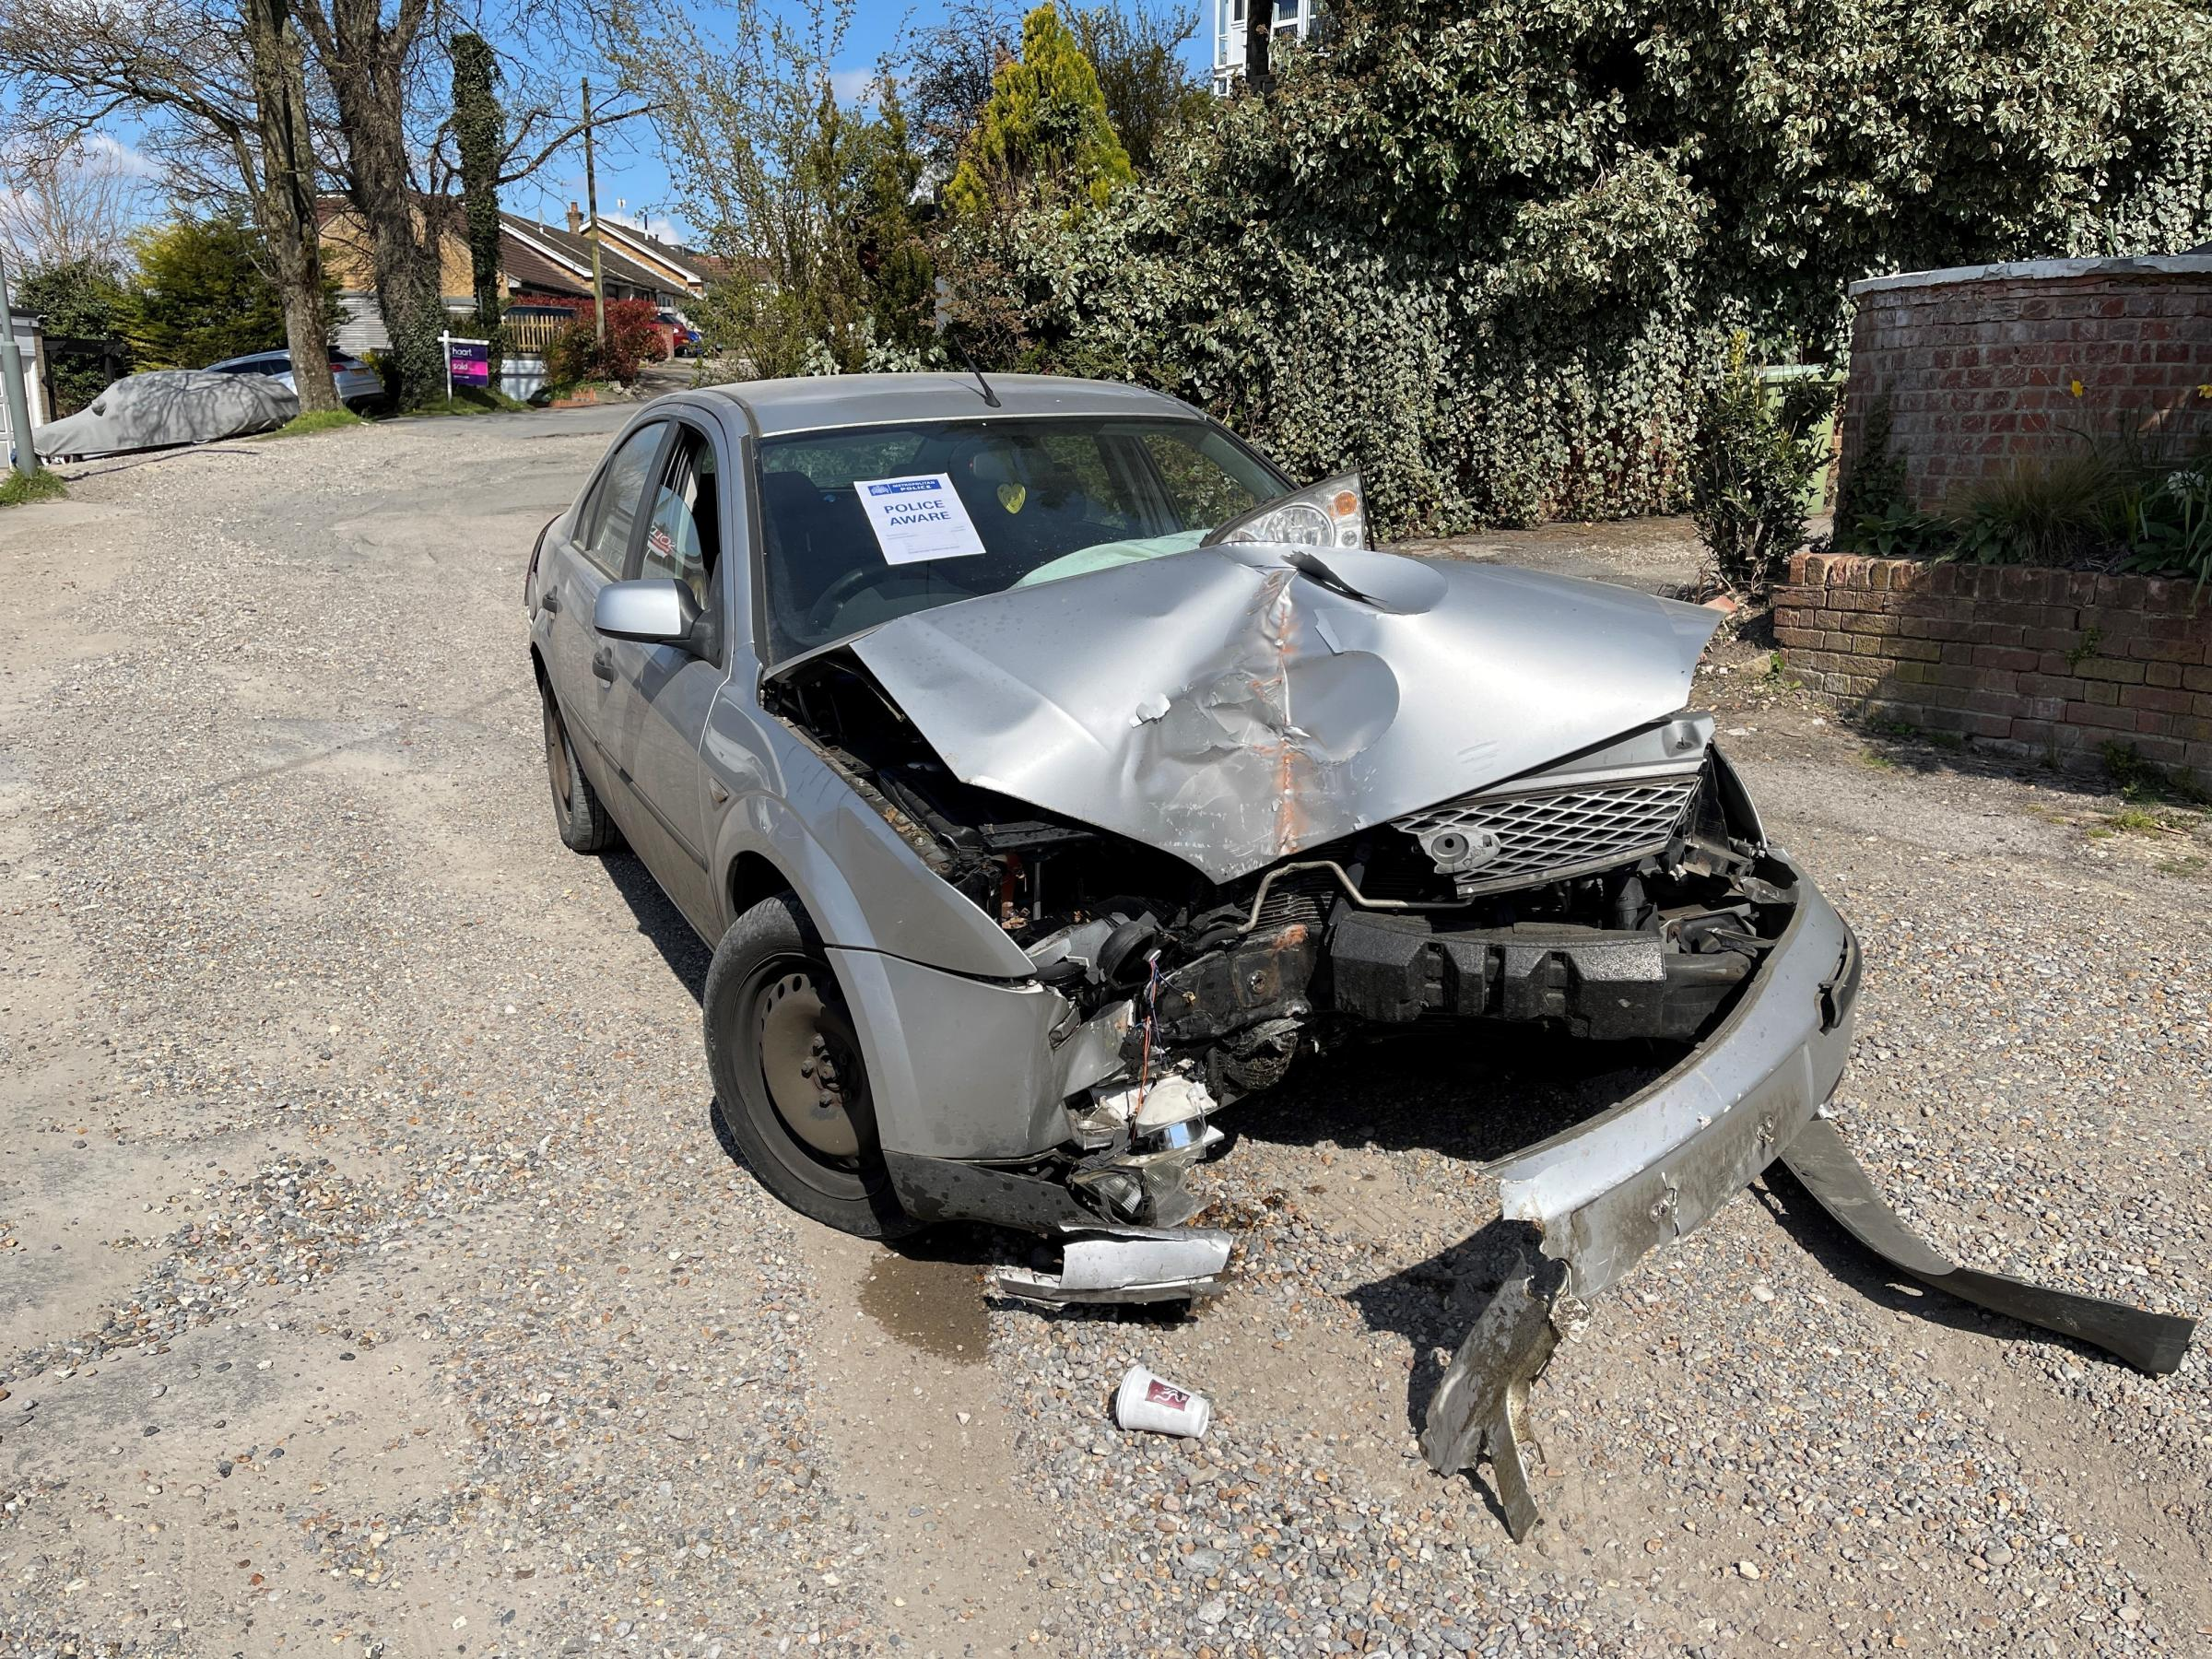 Photos taken at the scene in Biggin Hill - Andrew Clift